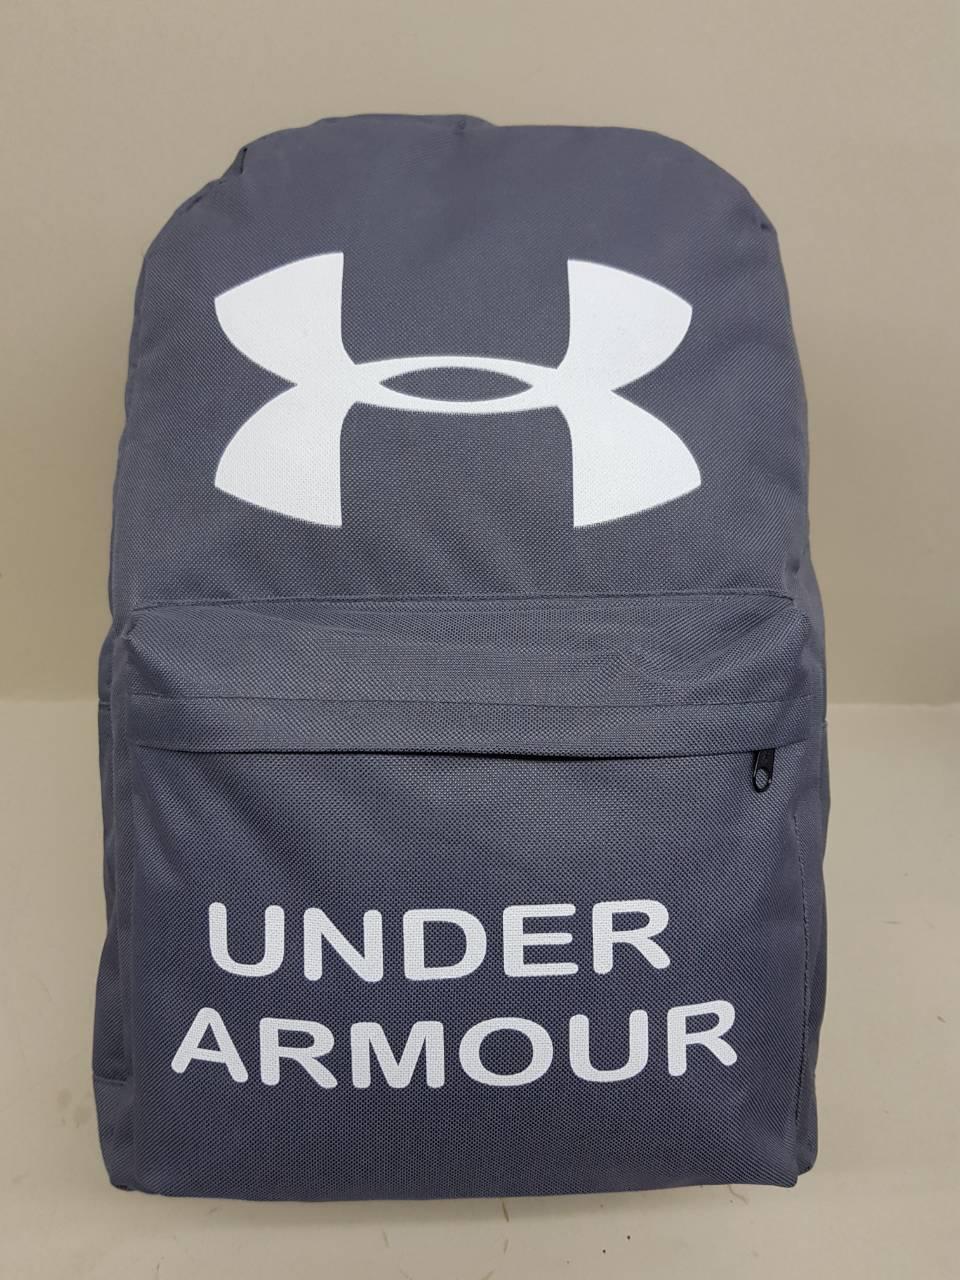 Спортивный рюкзак Under Armour (Андер Армор), серый цвет